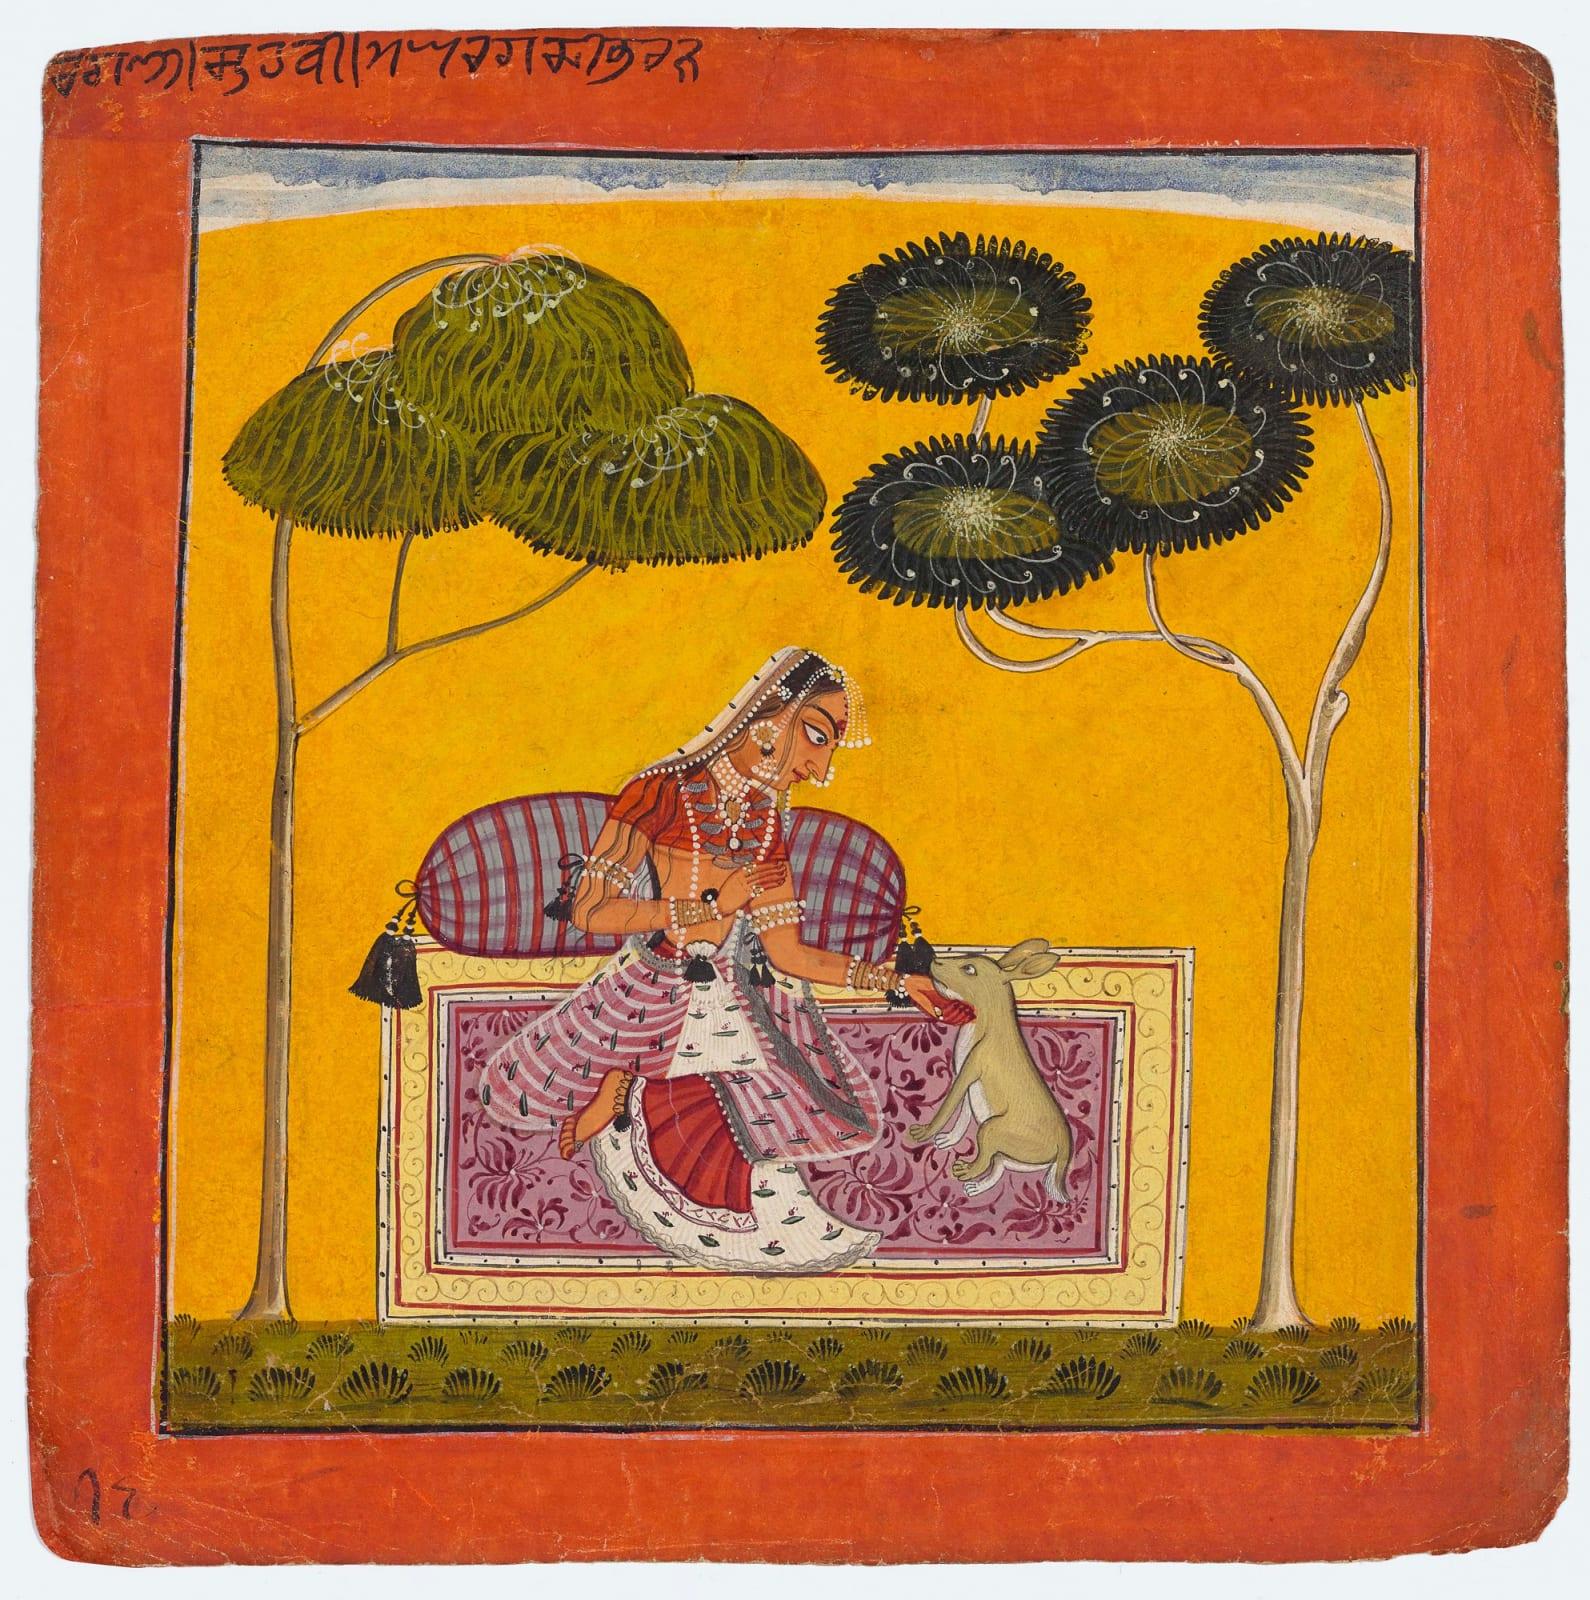 Ragini Suhavi, wife of Megha raga: Page from a Ragamala series, Circle of Devidasa, Nurpur or Basohli, c. 1685–88